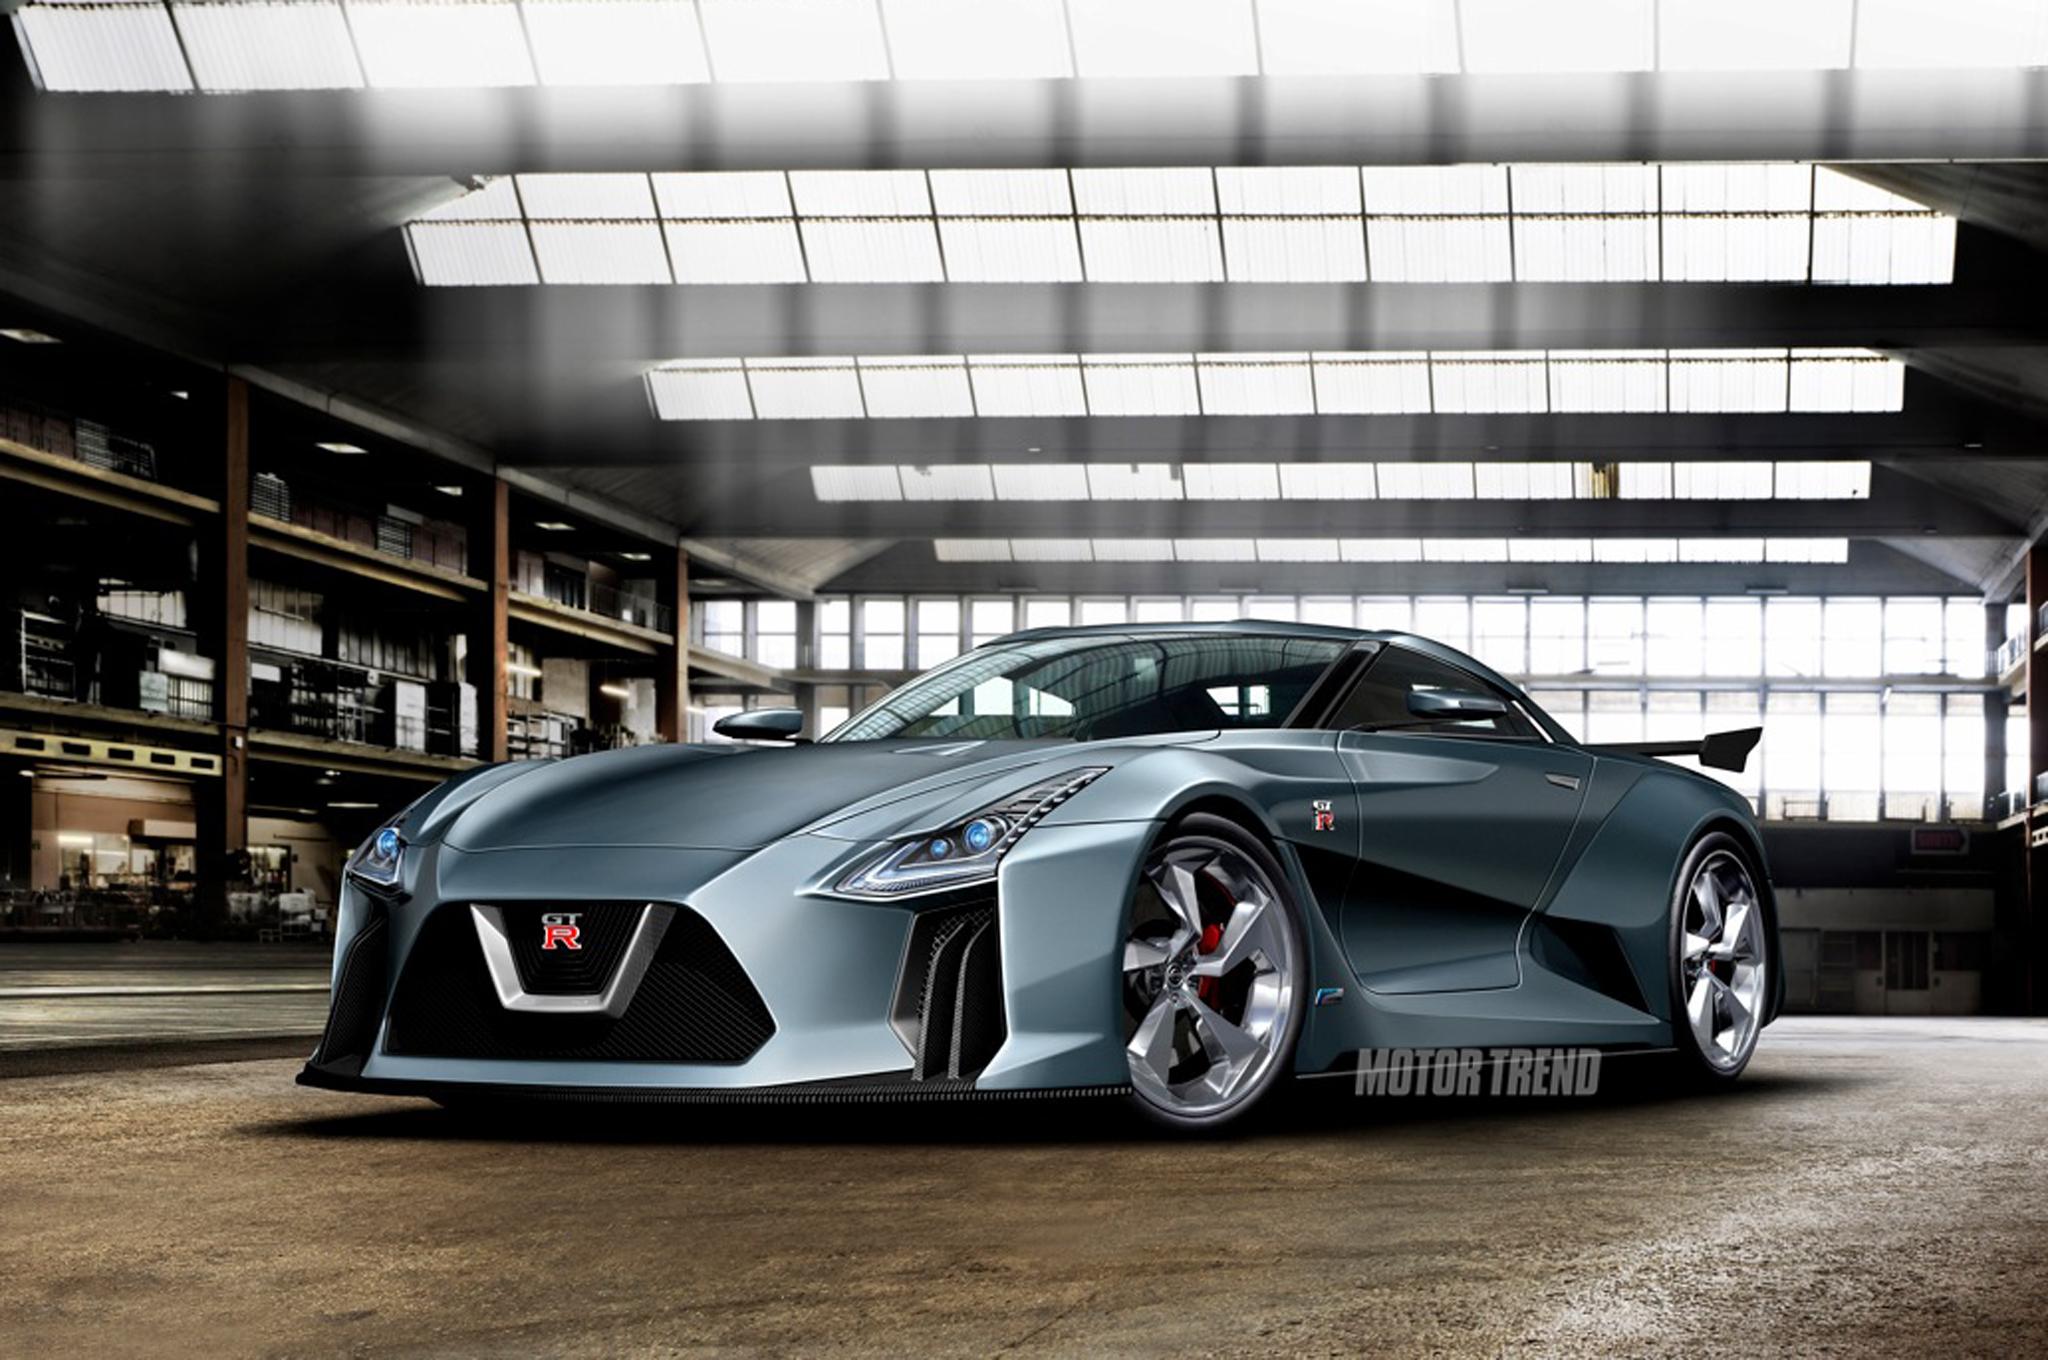 2016 Nissan Skyline >> Free Download 2016 Nissan Gt R 26 Car Hd Wallpaper Hd